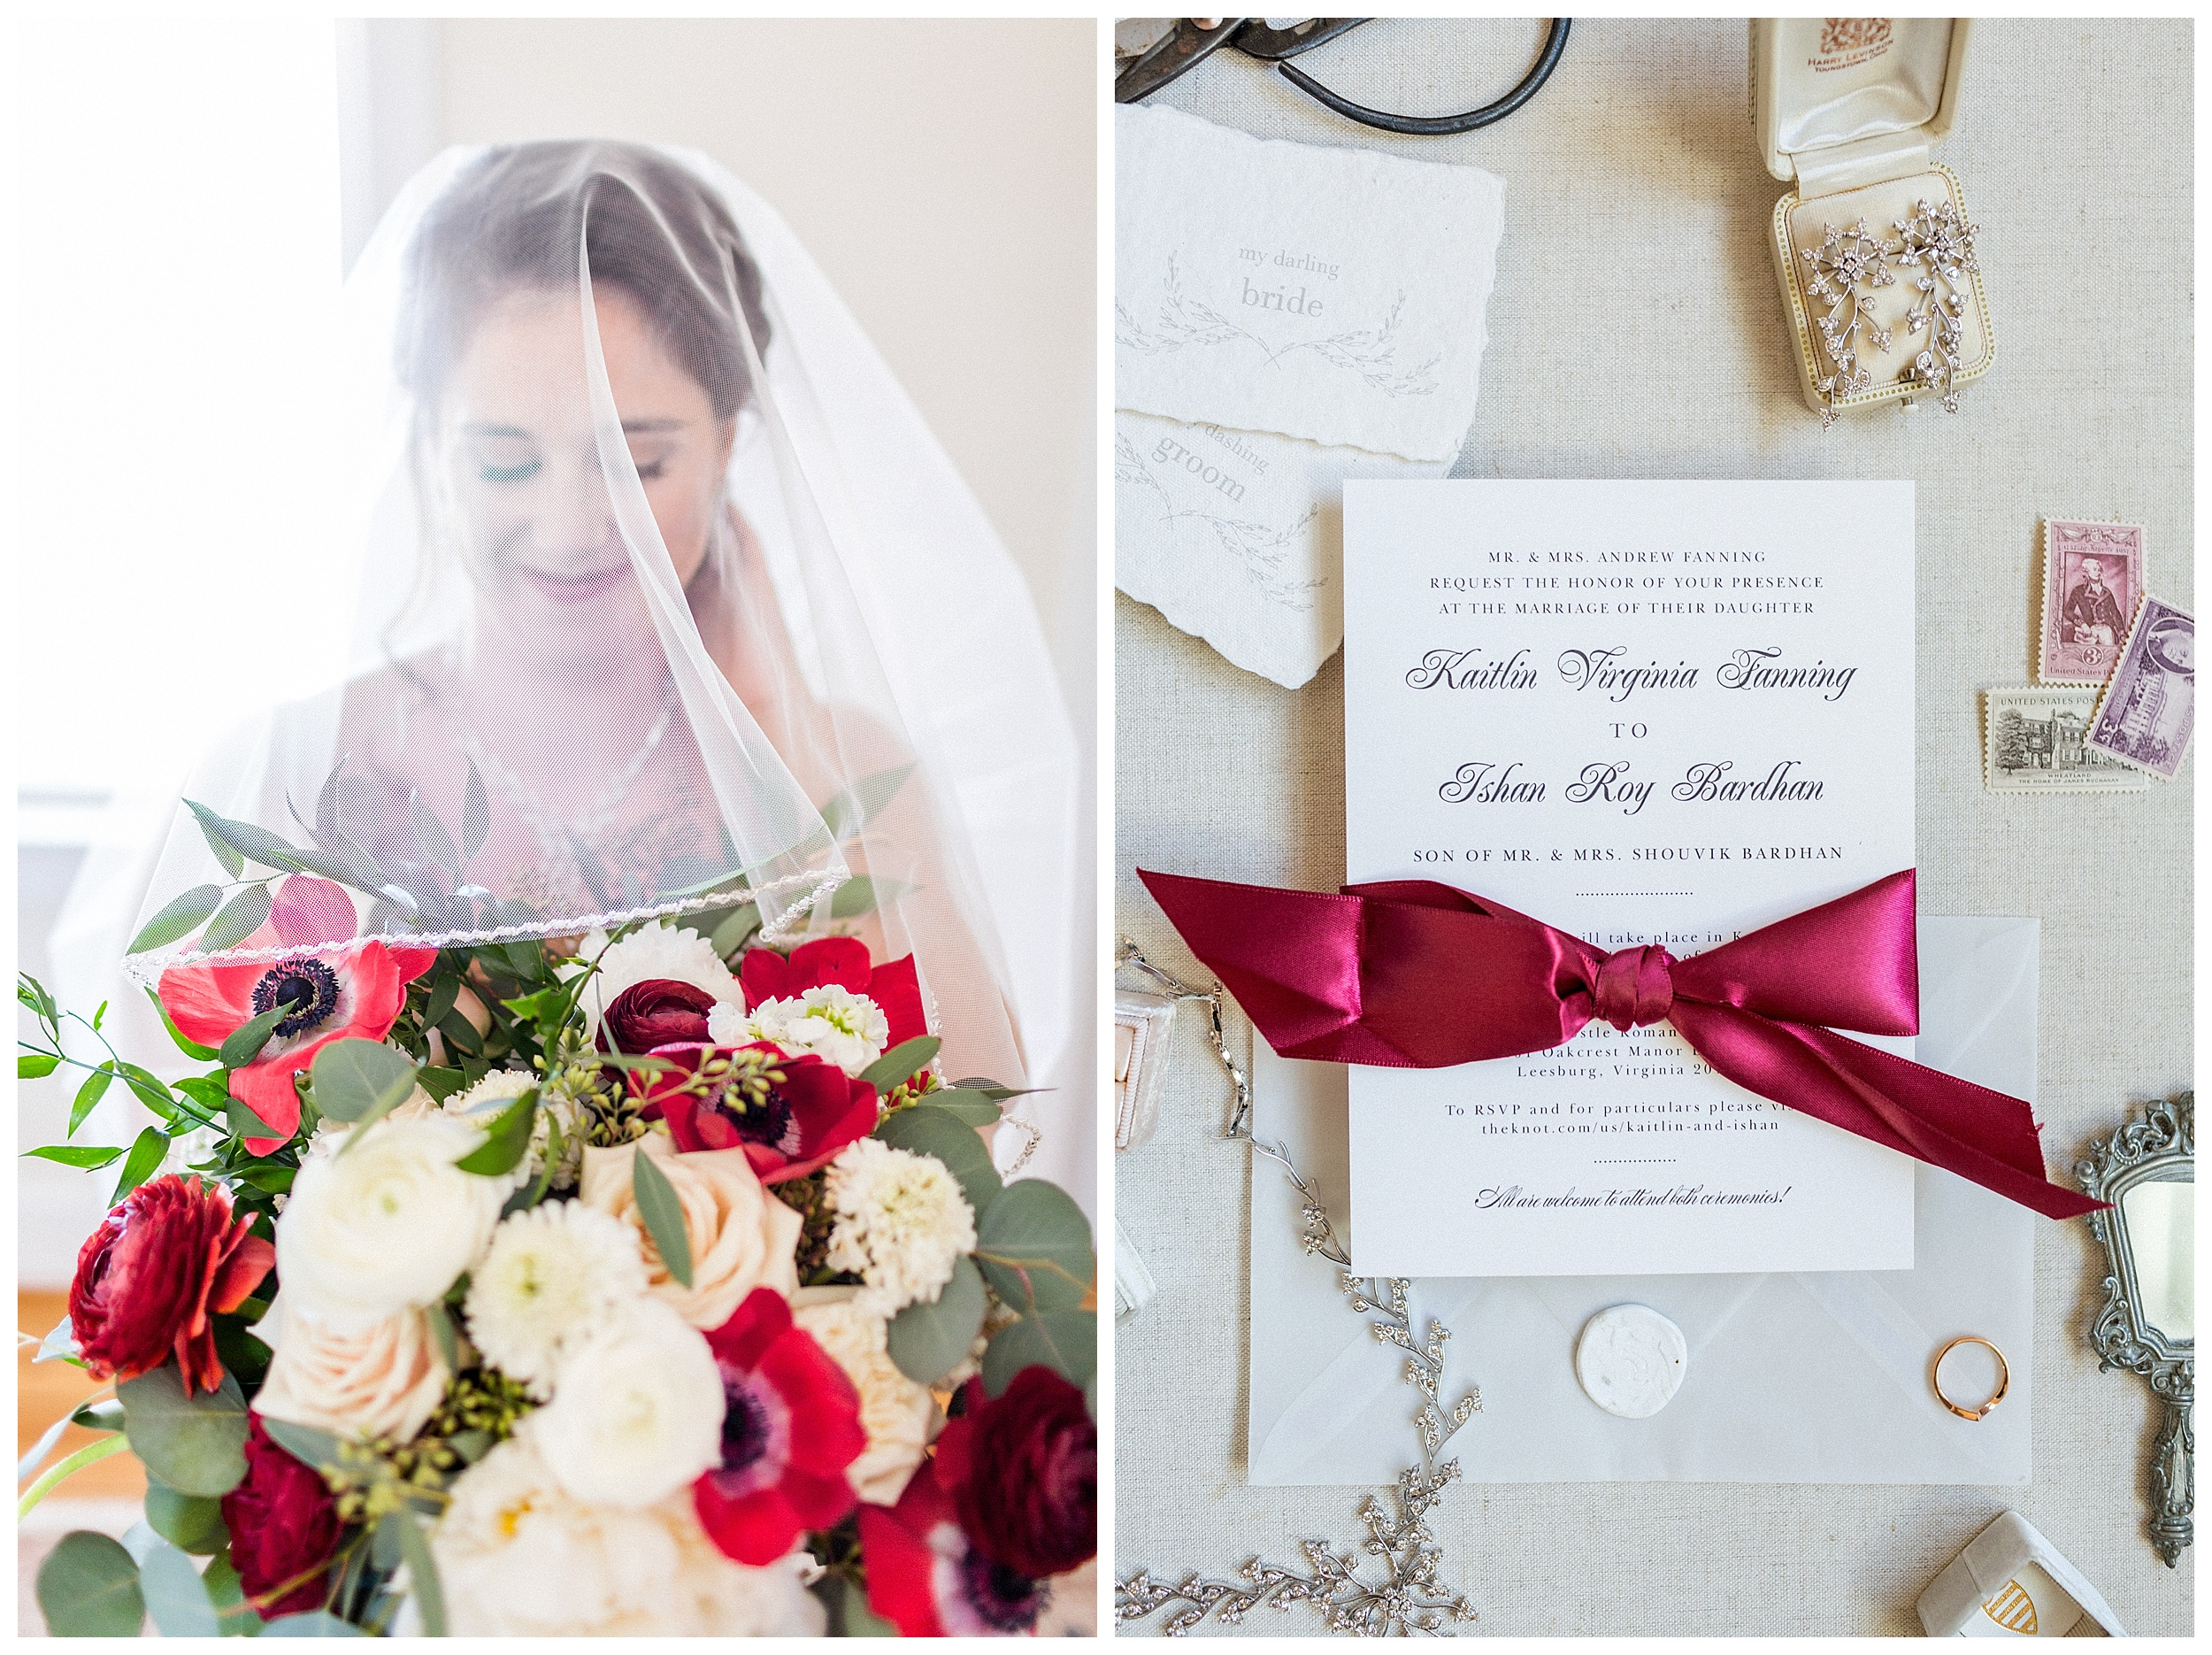 Stone Tower Winery Wedding | Virginia Winter Wedding | VA Wedding Photographer Kir Tuben_0024.jpg